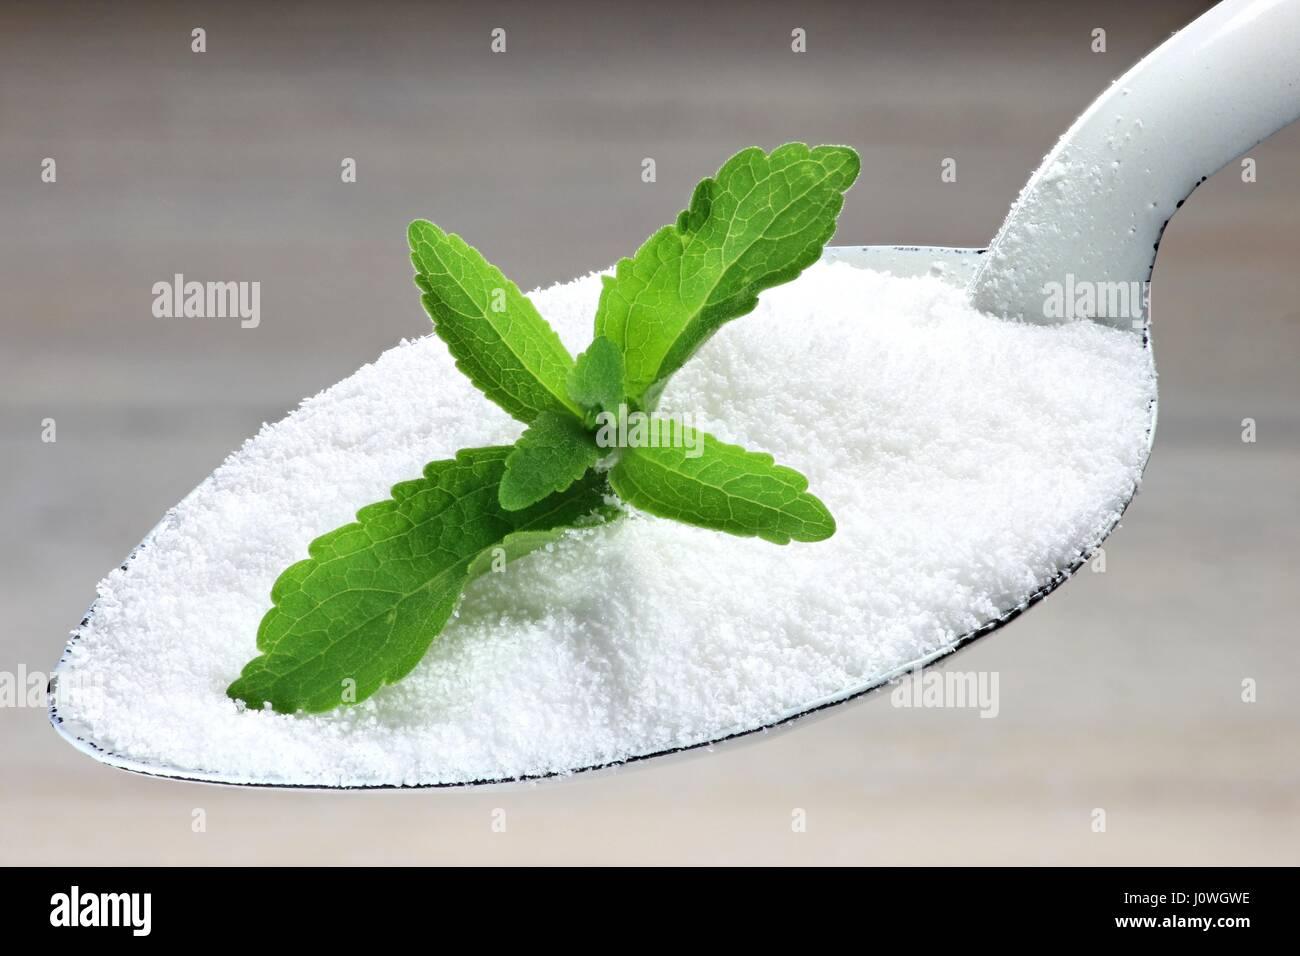 enamel spoon with alternative sweetener stevia - Stock Image